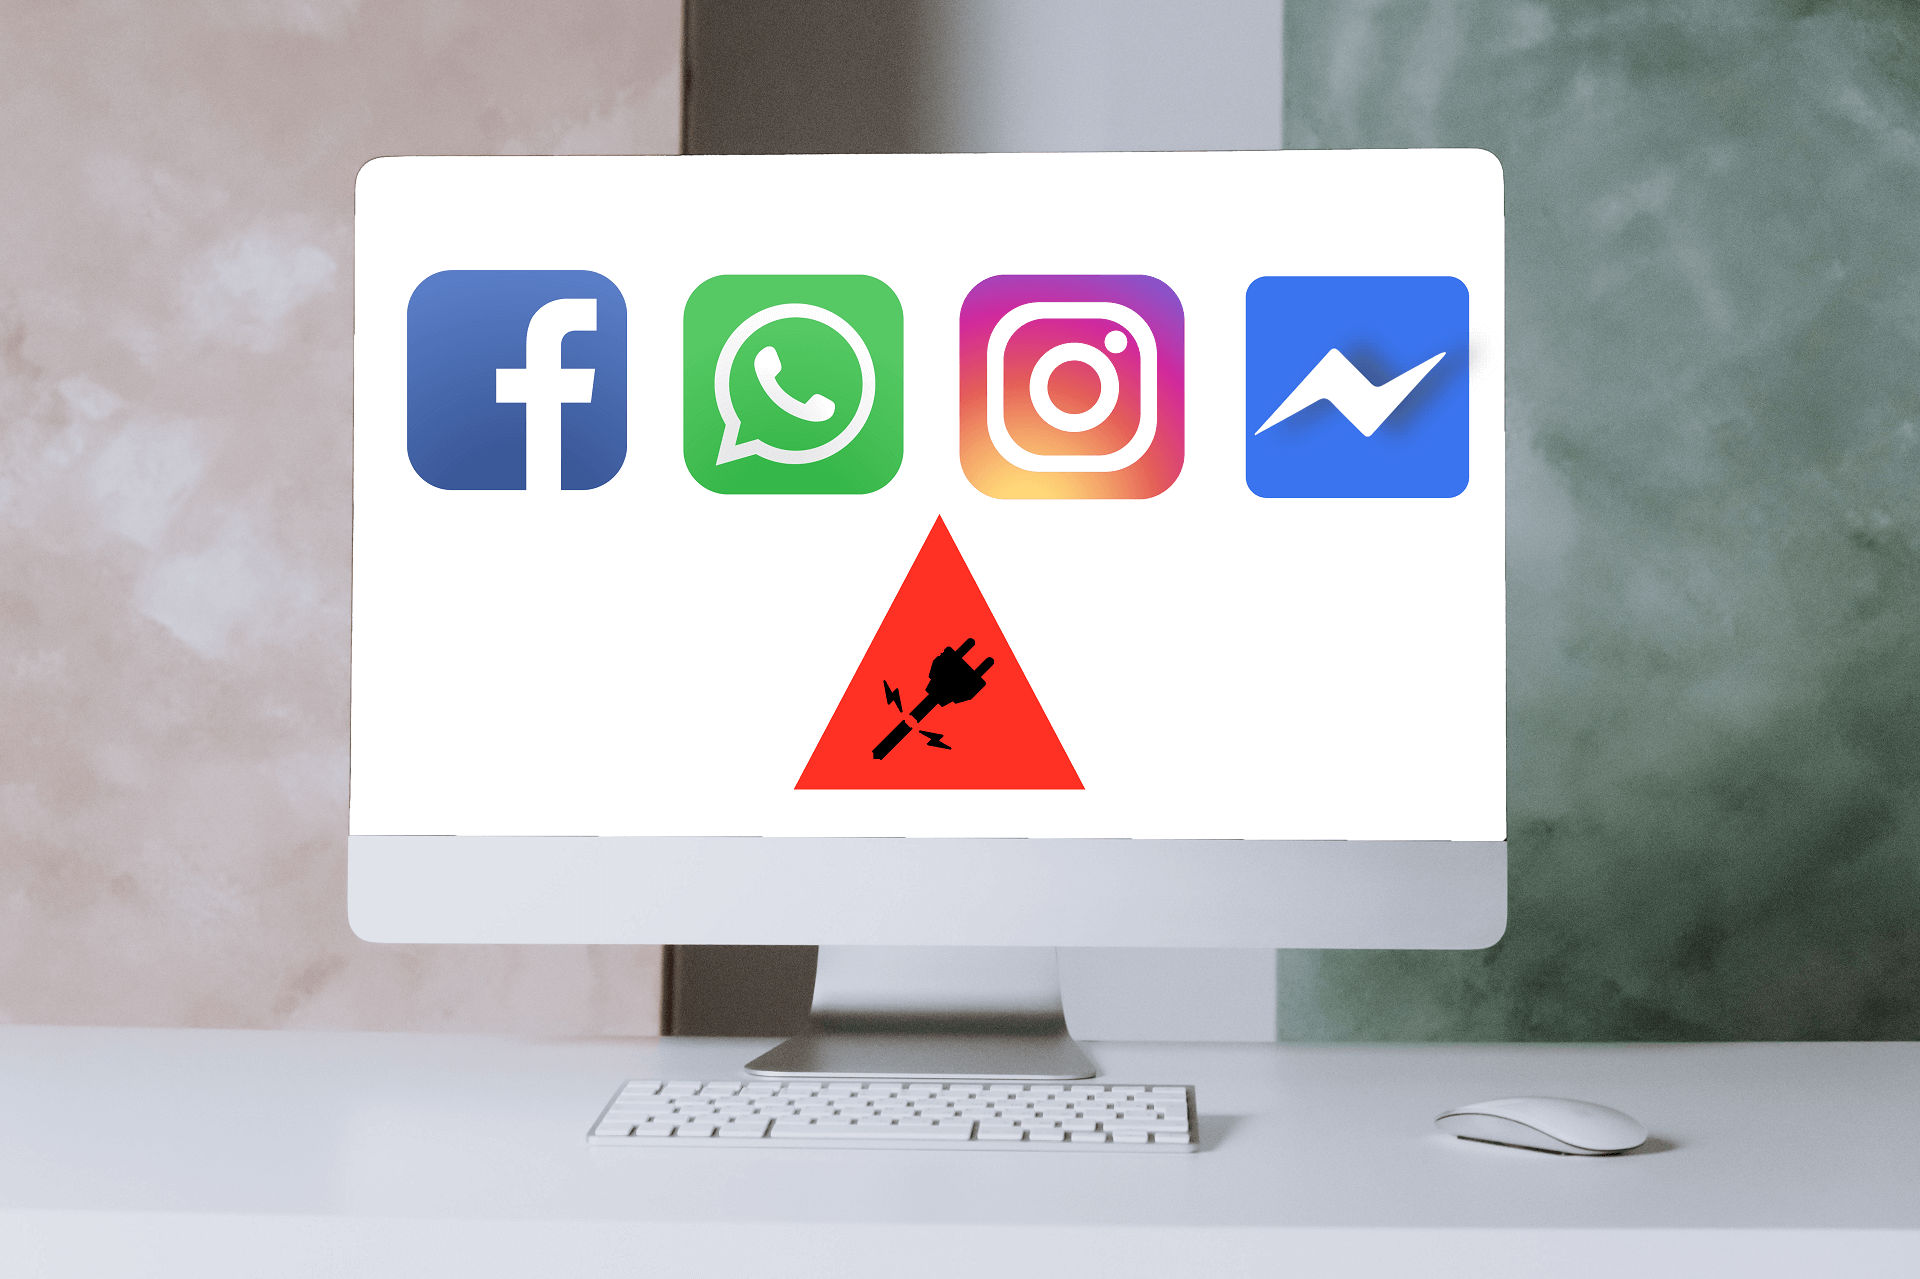 BUG Mondial de Facebook, Messenger, WhatsApp et Instagram